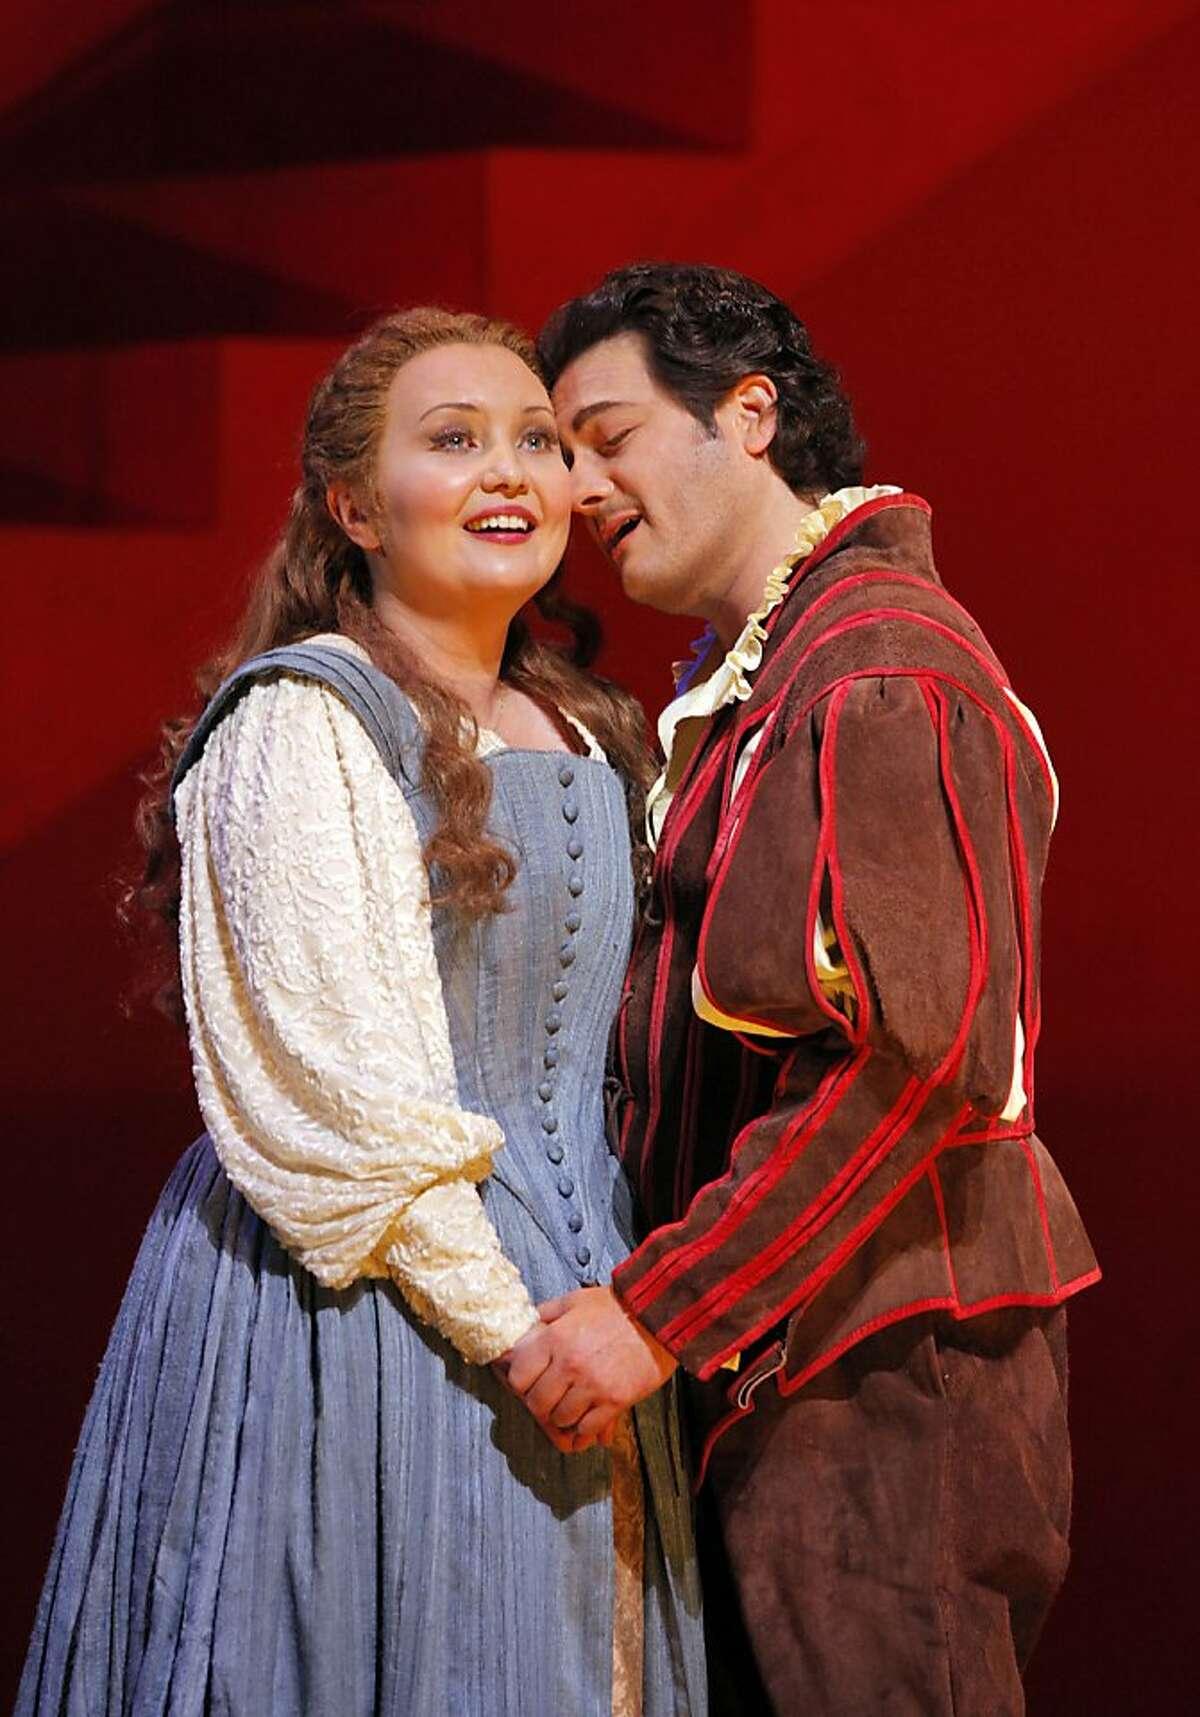 Rigoletto Albina Shagimuratova (Gilda) and Arturo Chac-n-Cruz (The Duke of Mantua).